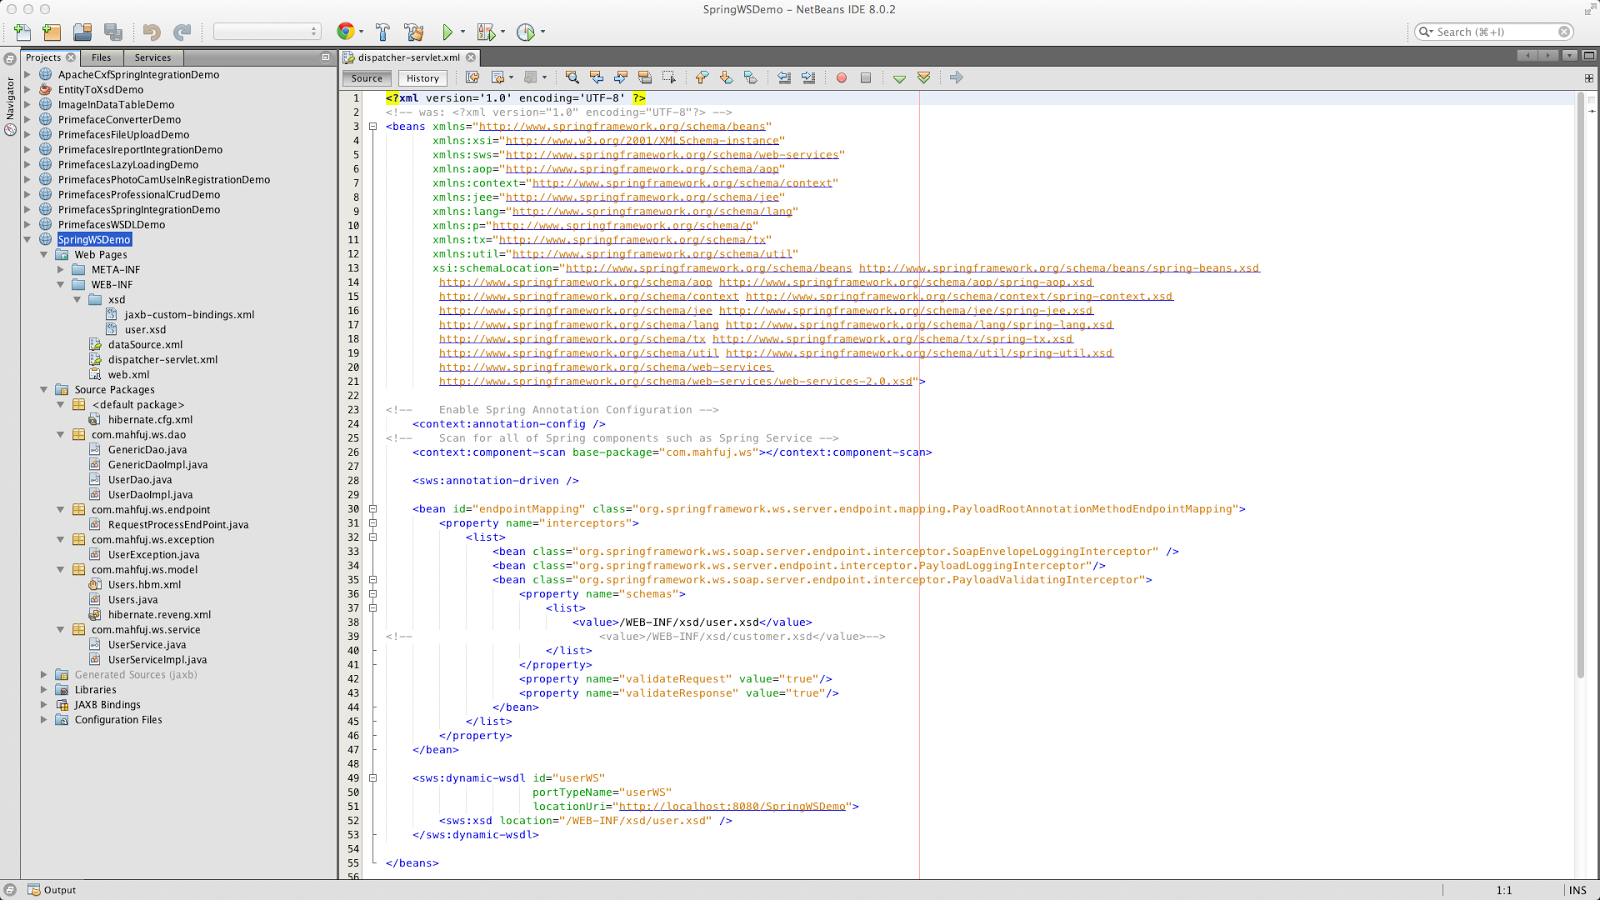 Citputer: Spring Web Service Complete Tutorial Using Netbeans